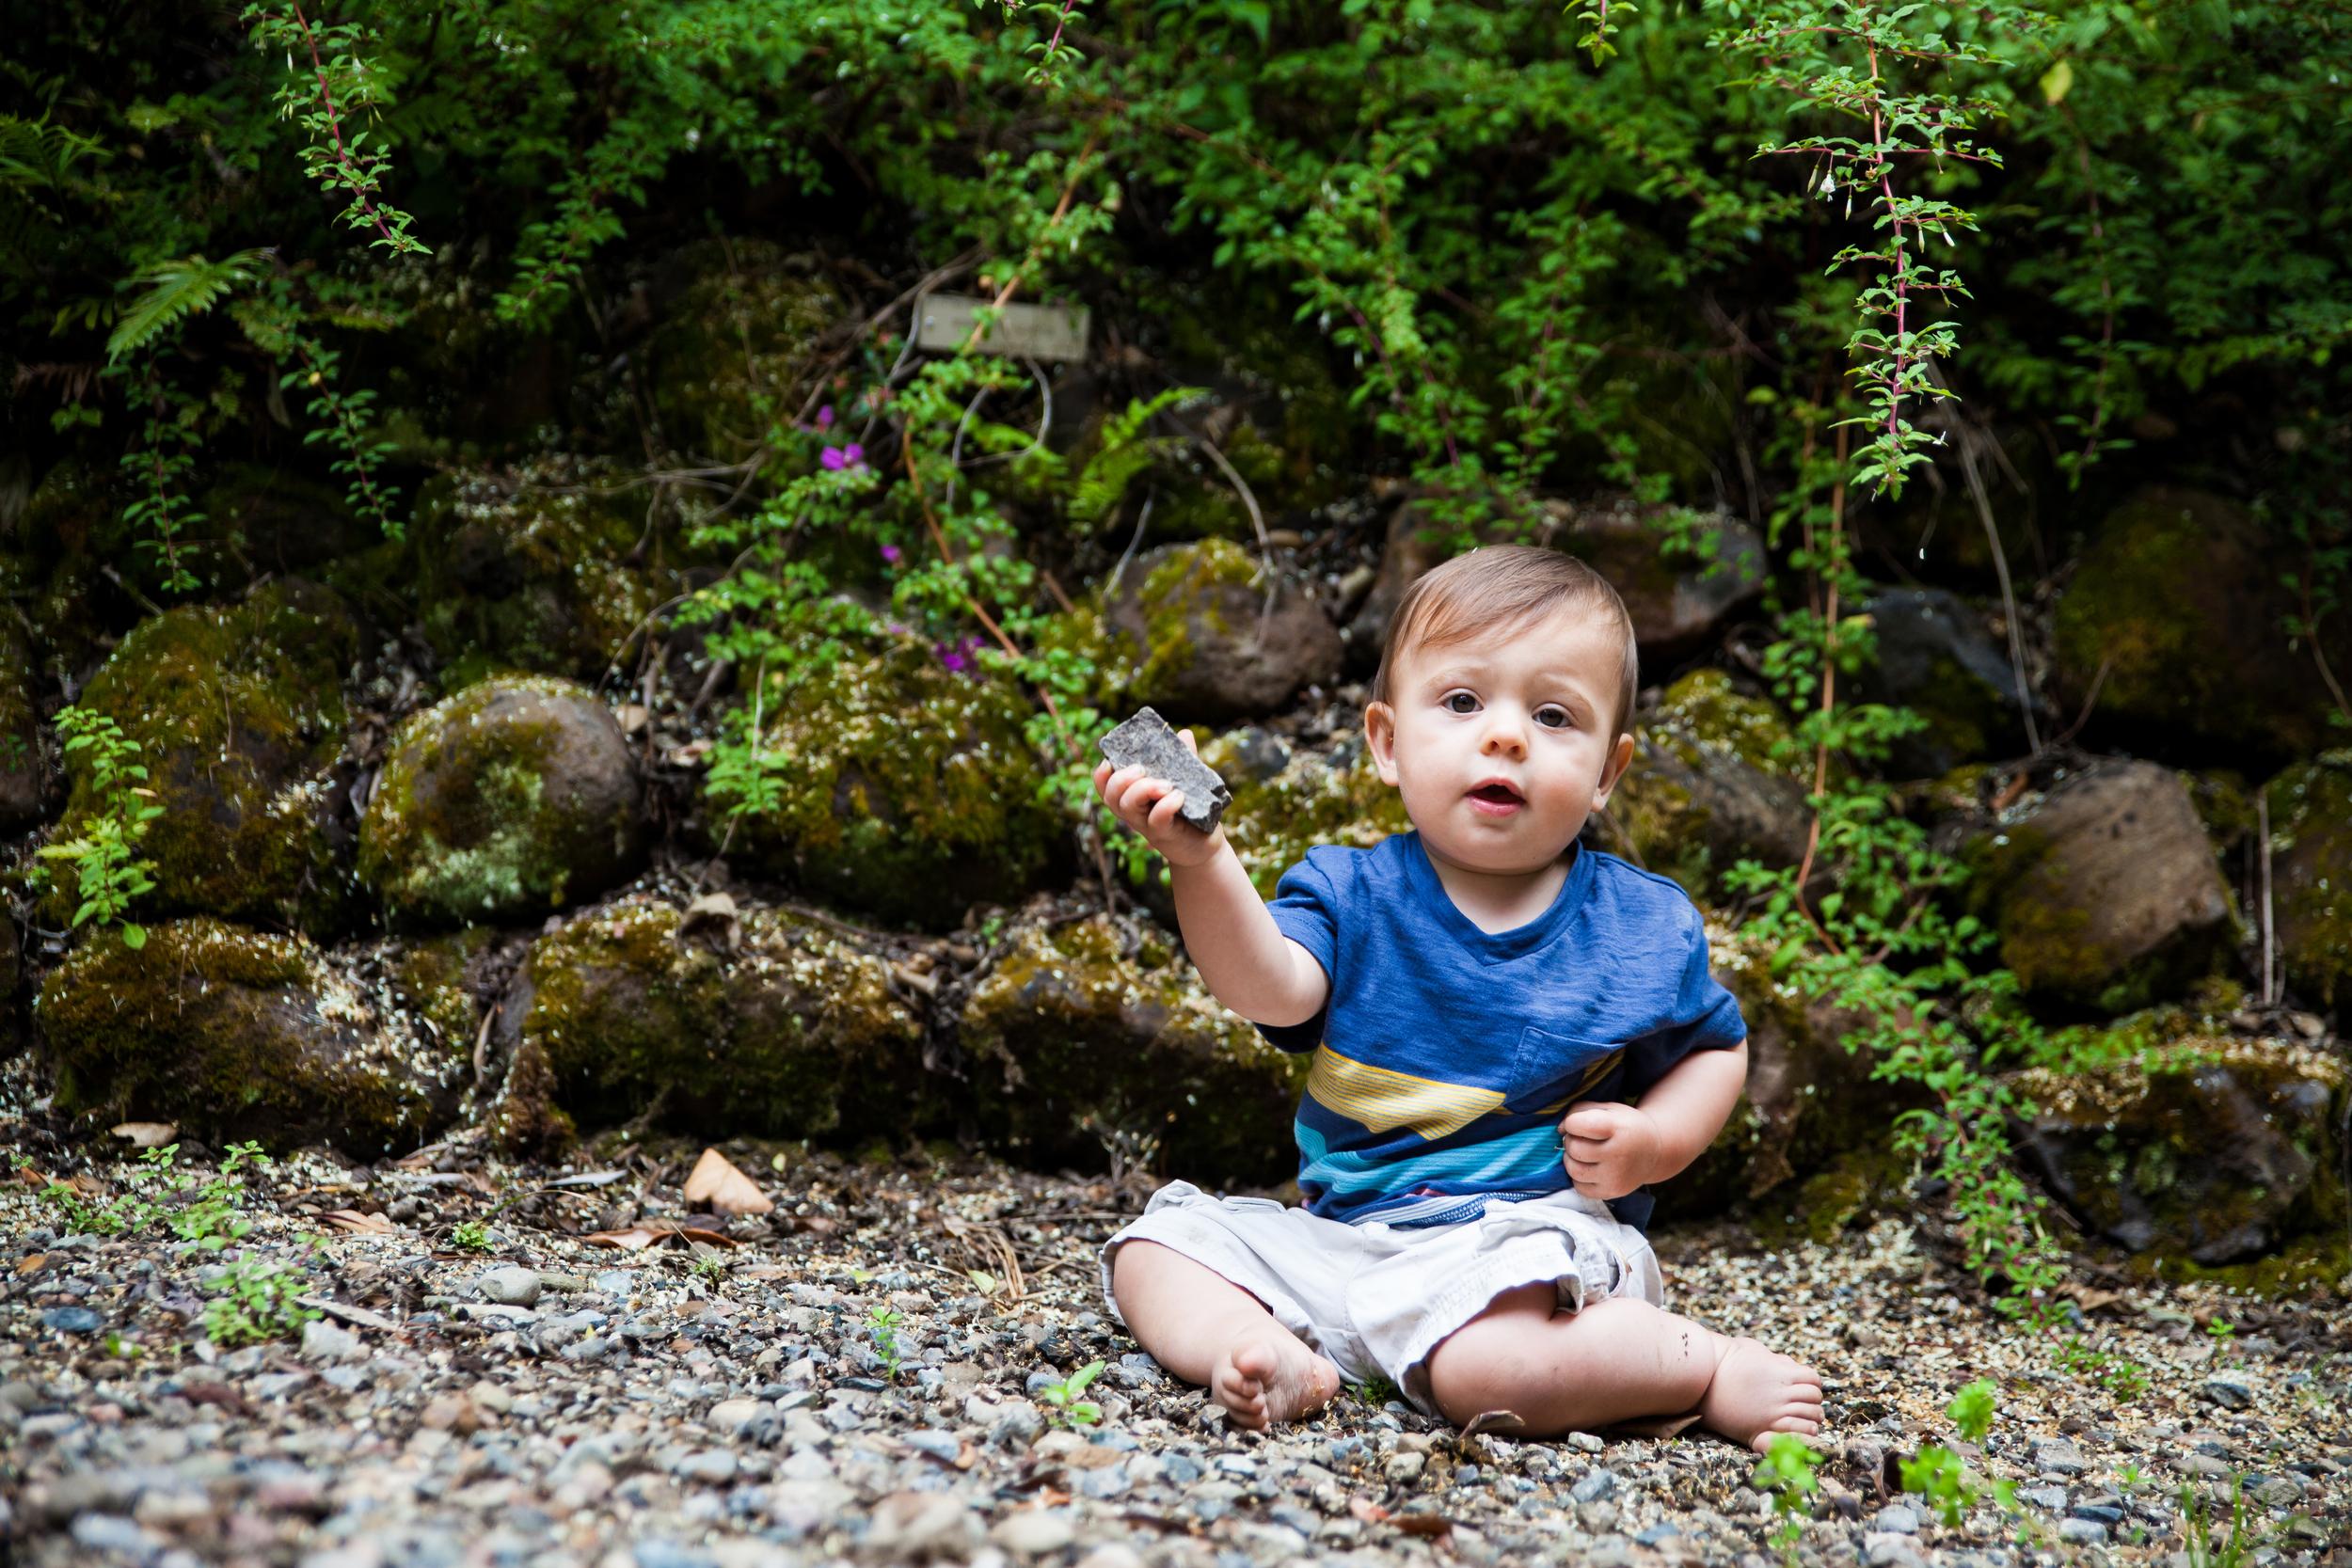 Rocks. This boy - always with rocks.